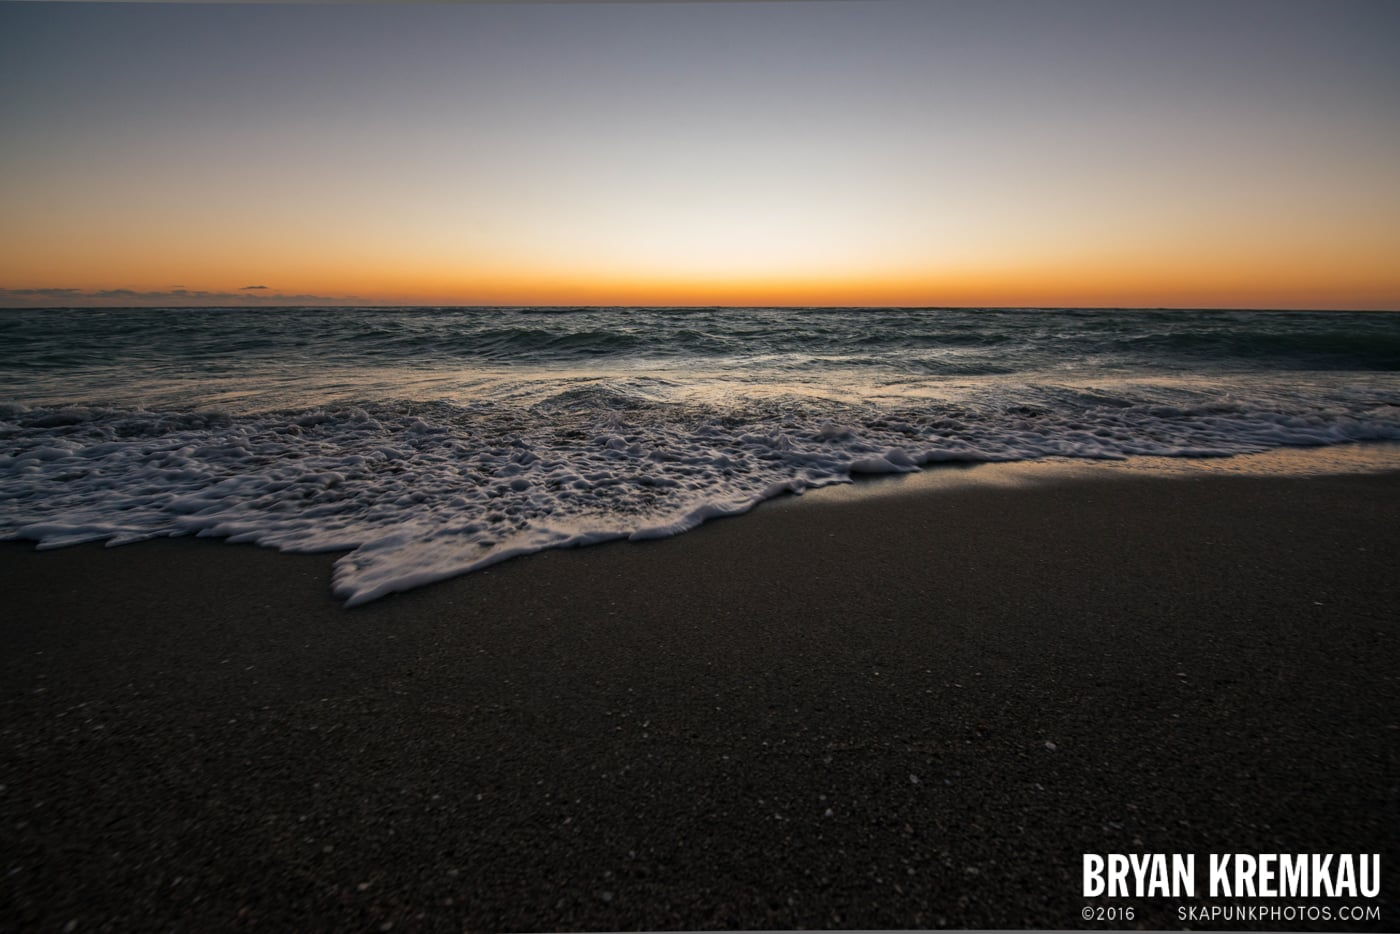 Sunsets, Astrophotography & Birds @ Venice, Florida - 10.25.14 - 11.5.14 (93)